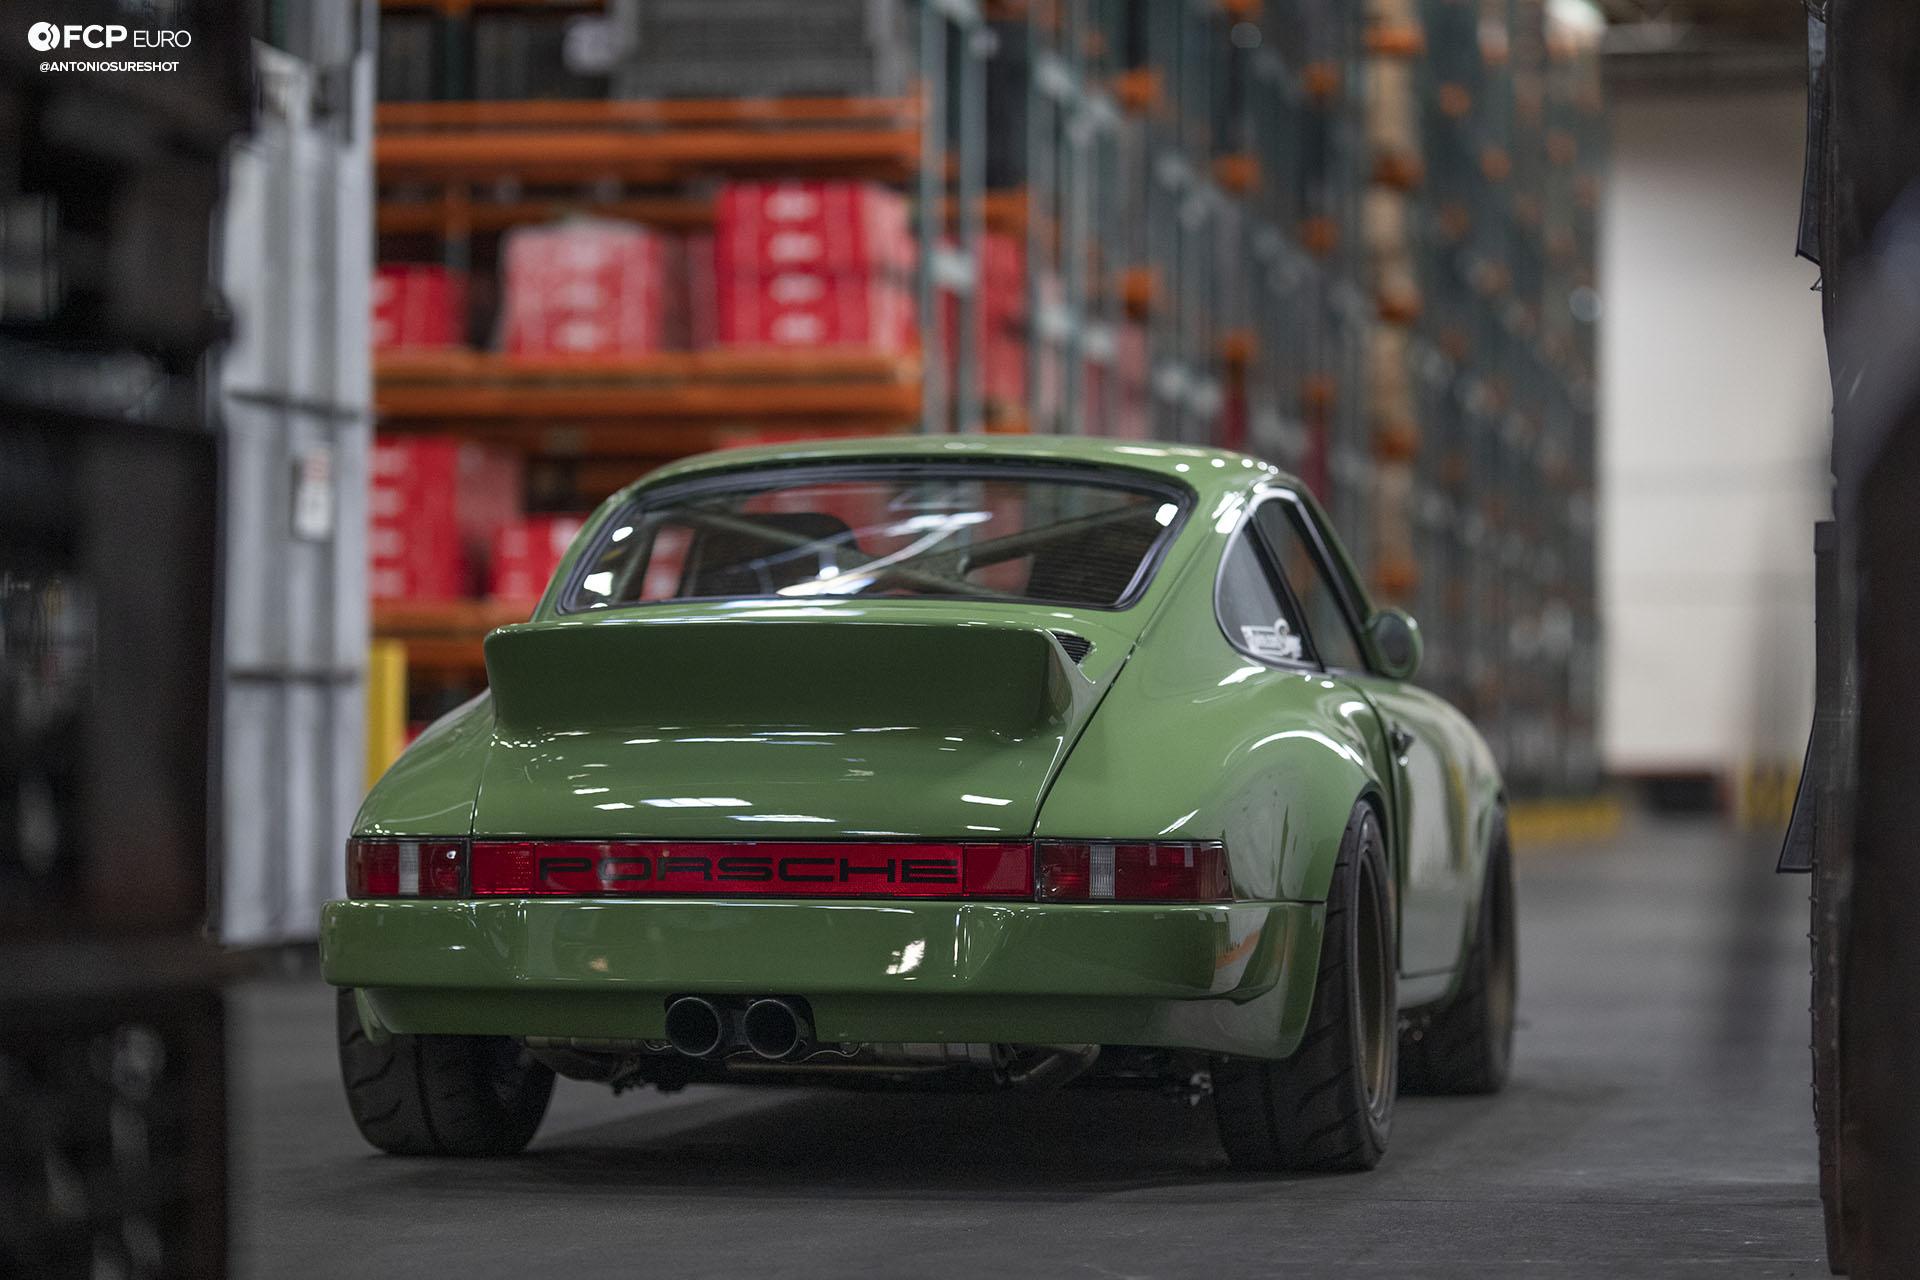 The Anti,Widebody \u2013 1982 Porsche 911 SC